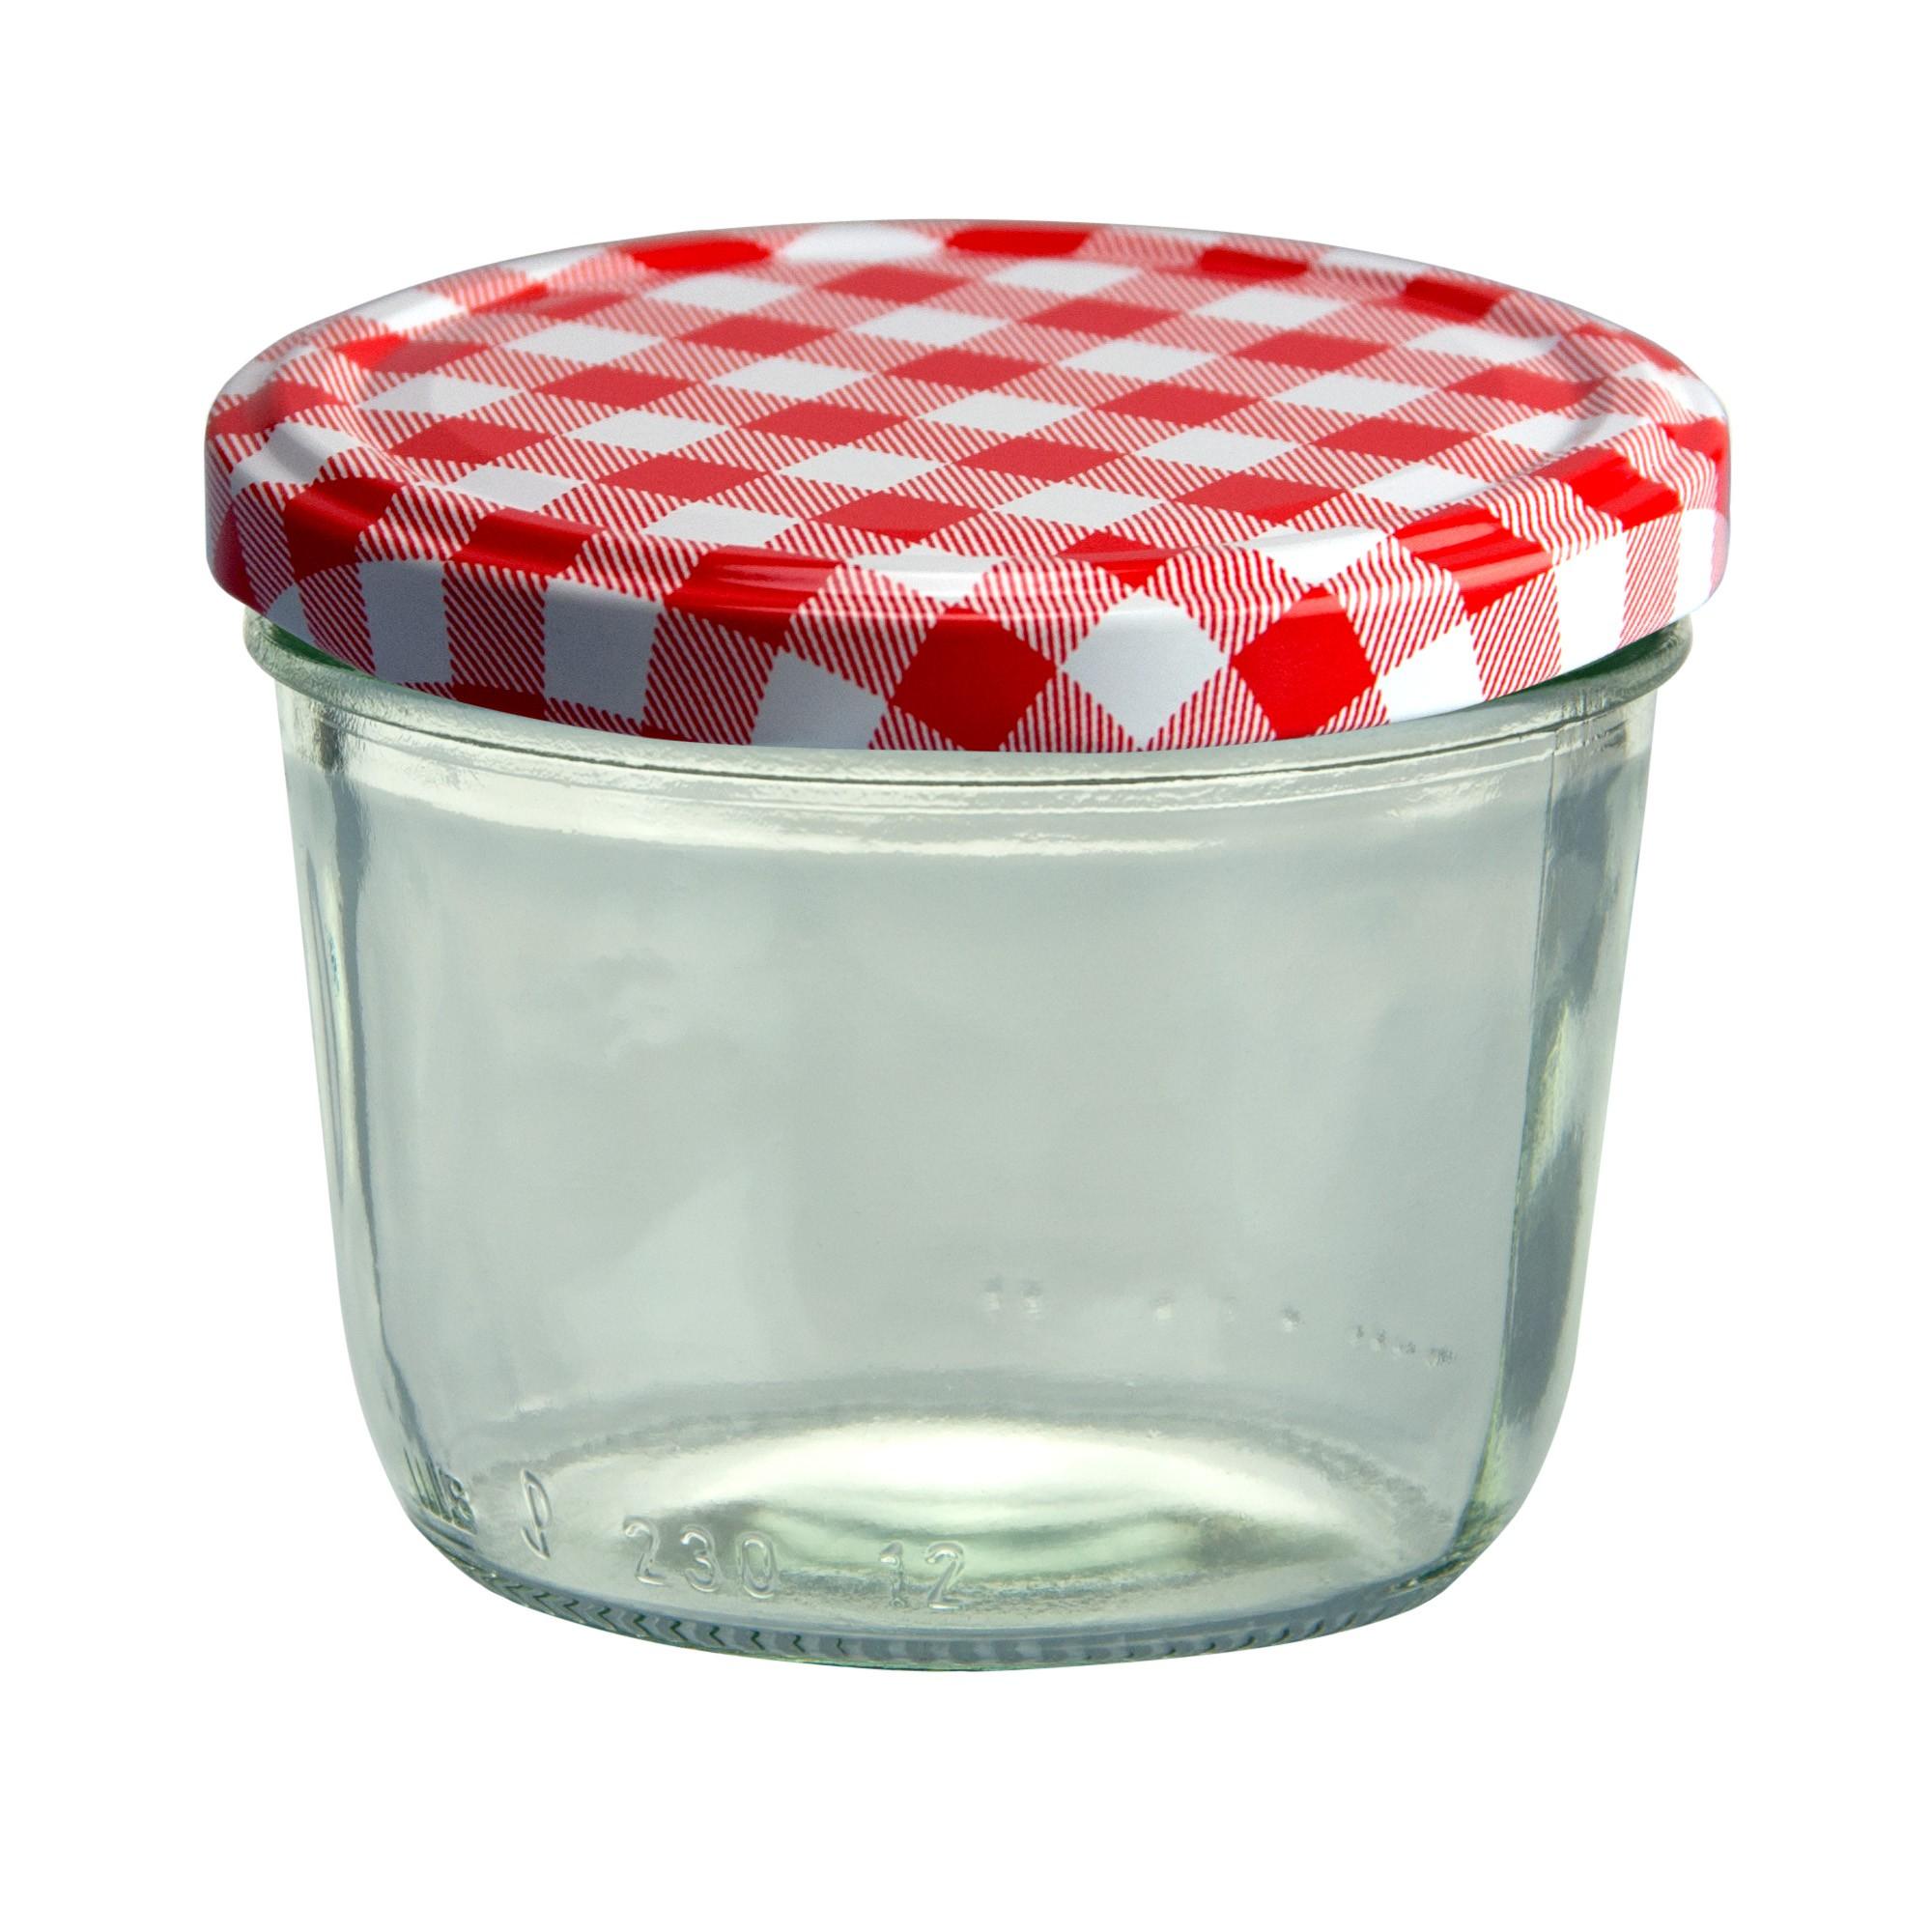 75er set sturzglas 230 ml marmeladenglas einmachglas. Black Bedroom Furniture Sets. Home Design Ideas